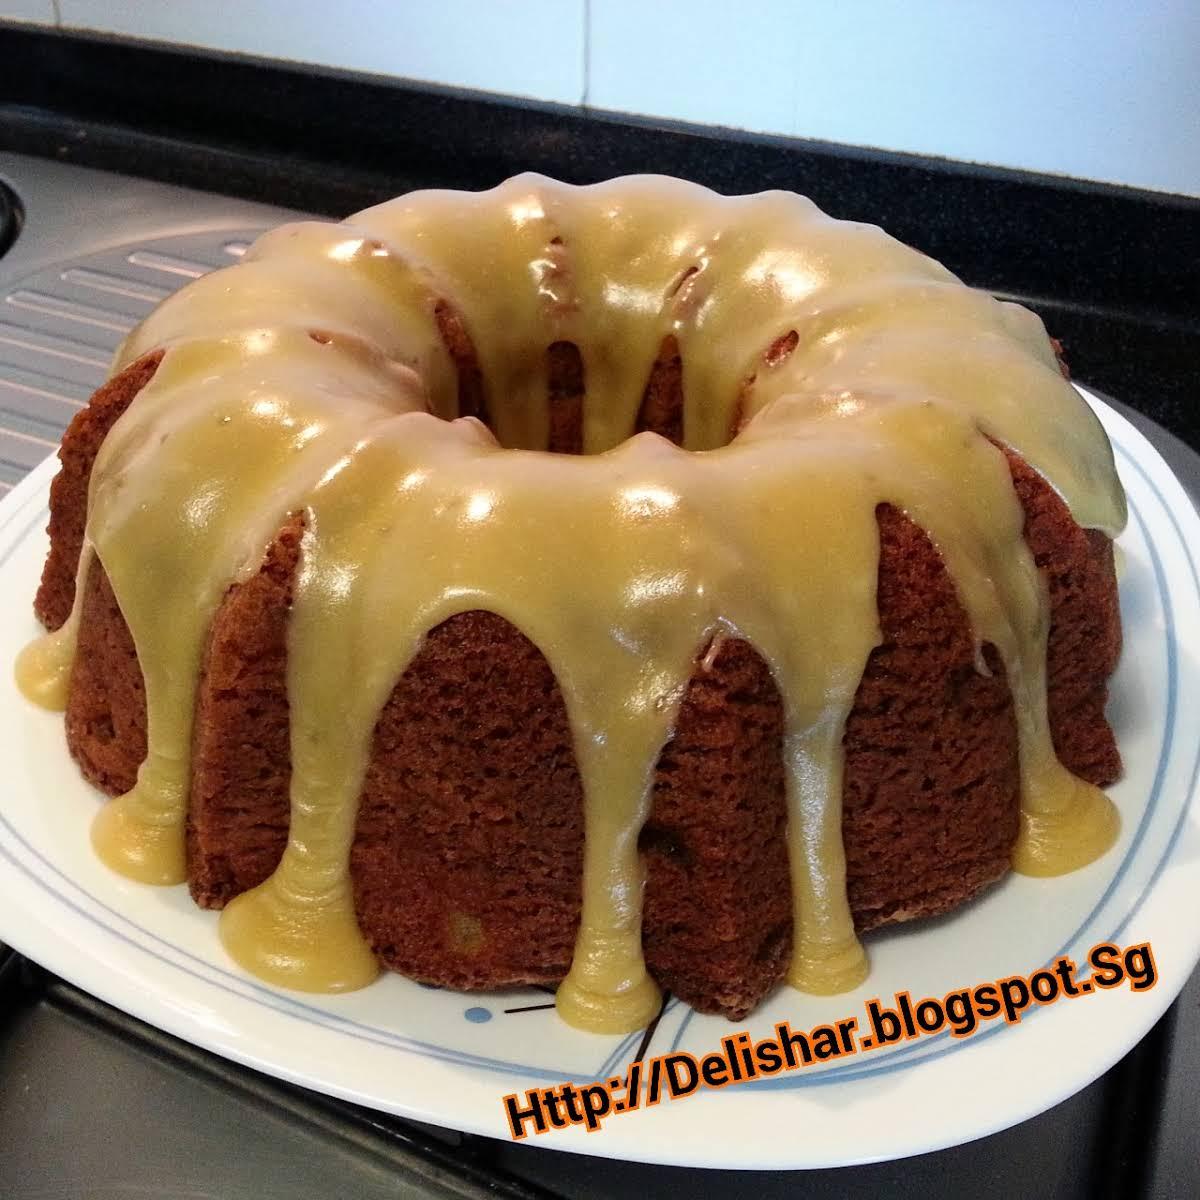 Spiced Apple Bundt Cake with Salted Caramel Glaze Recipe